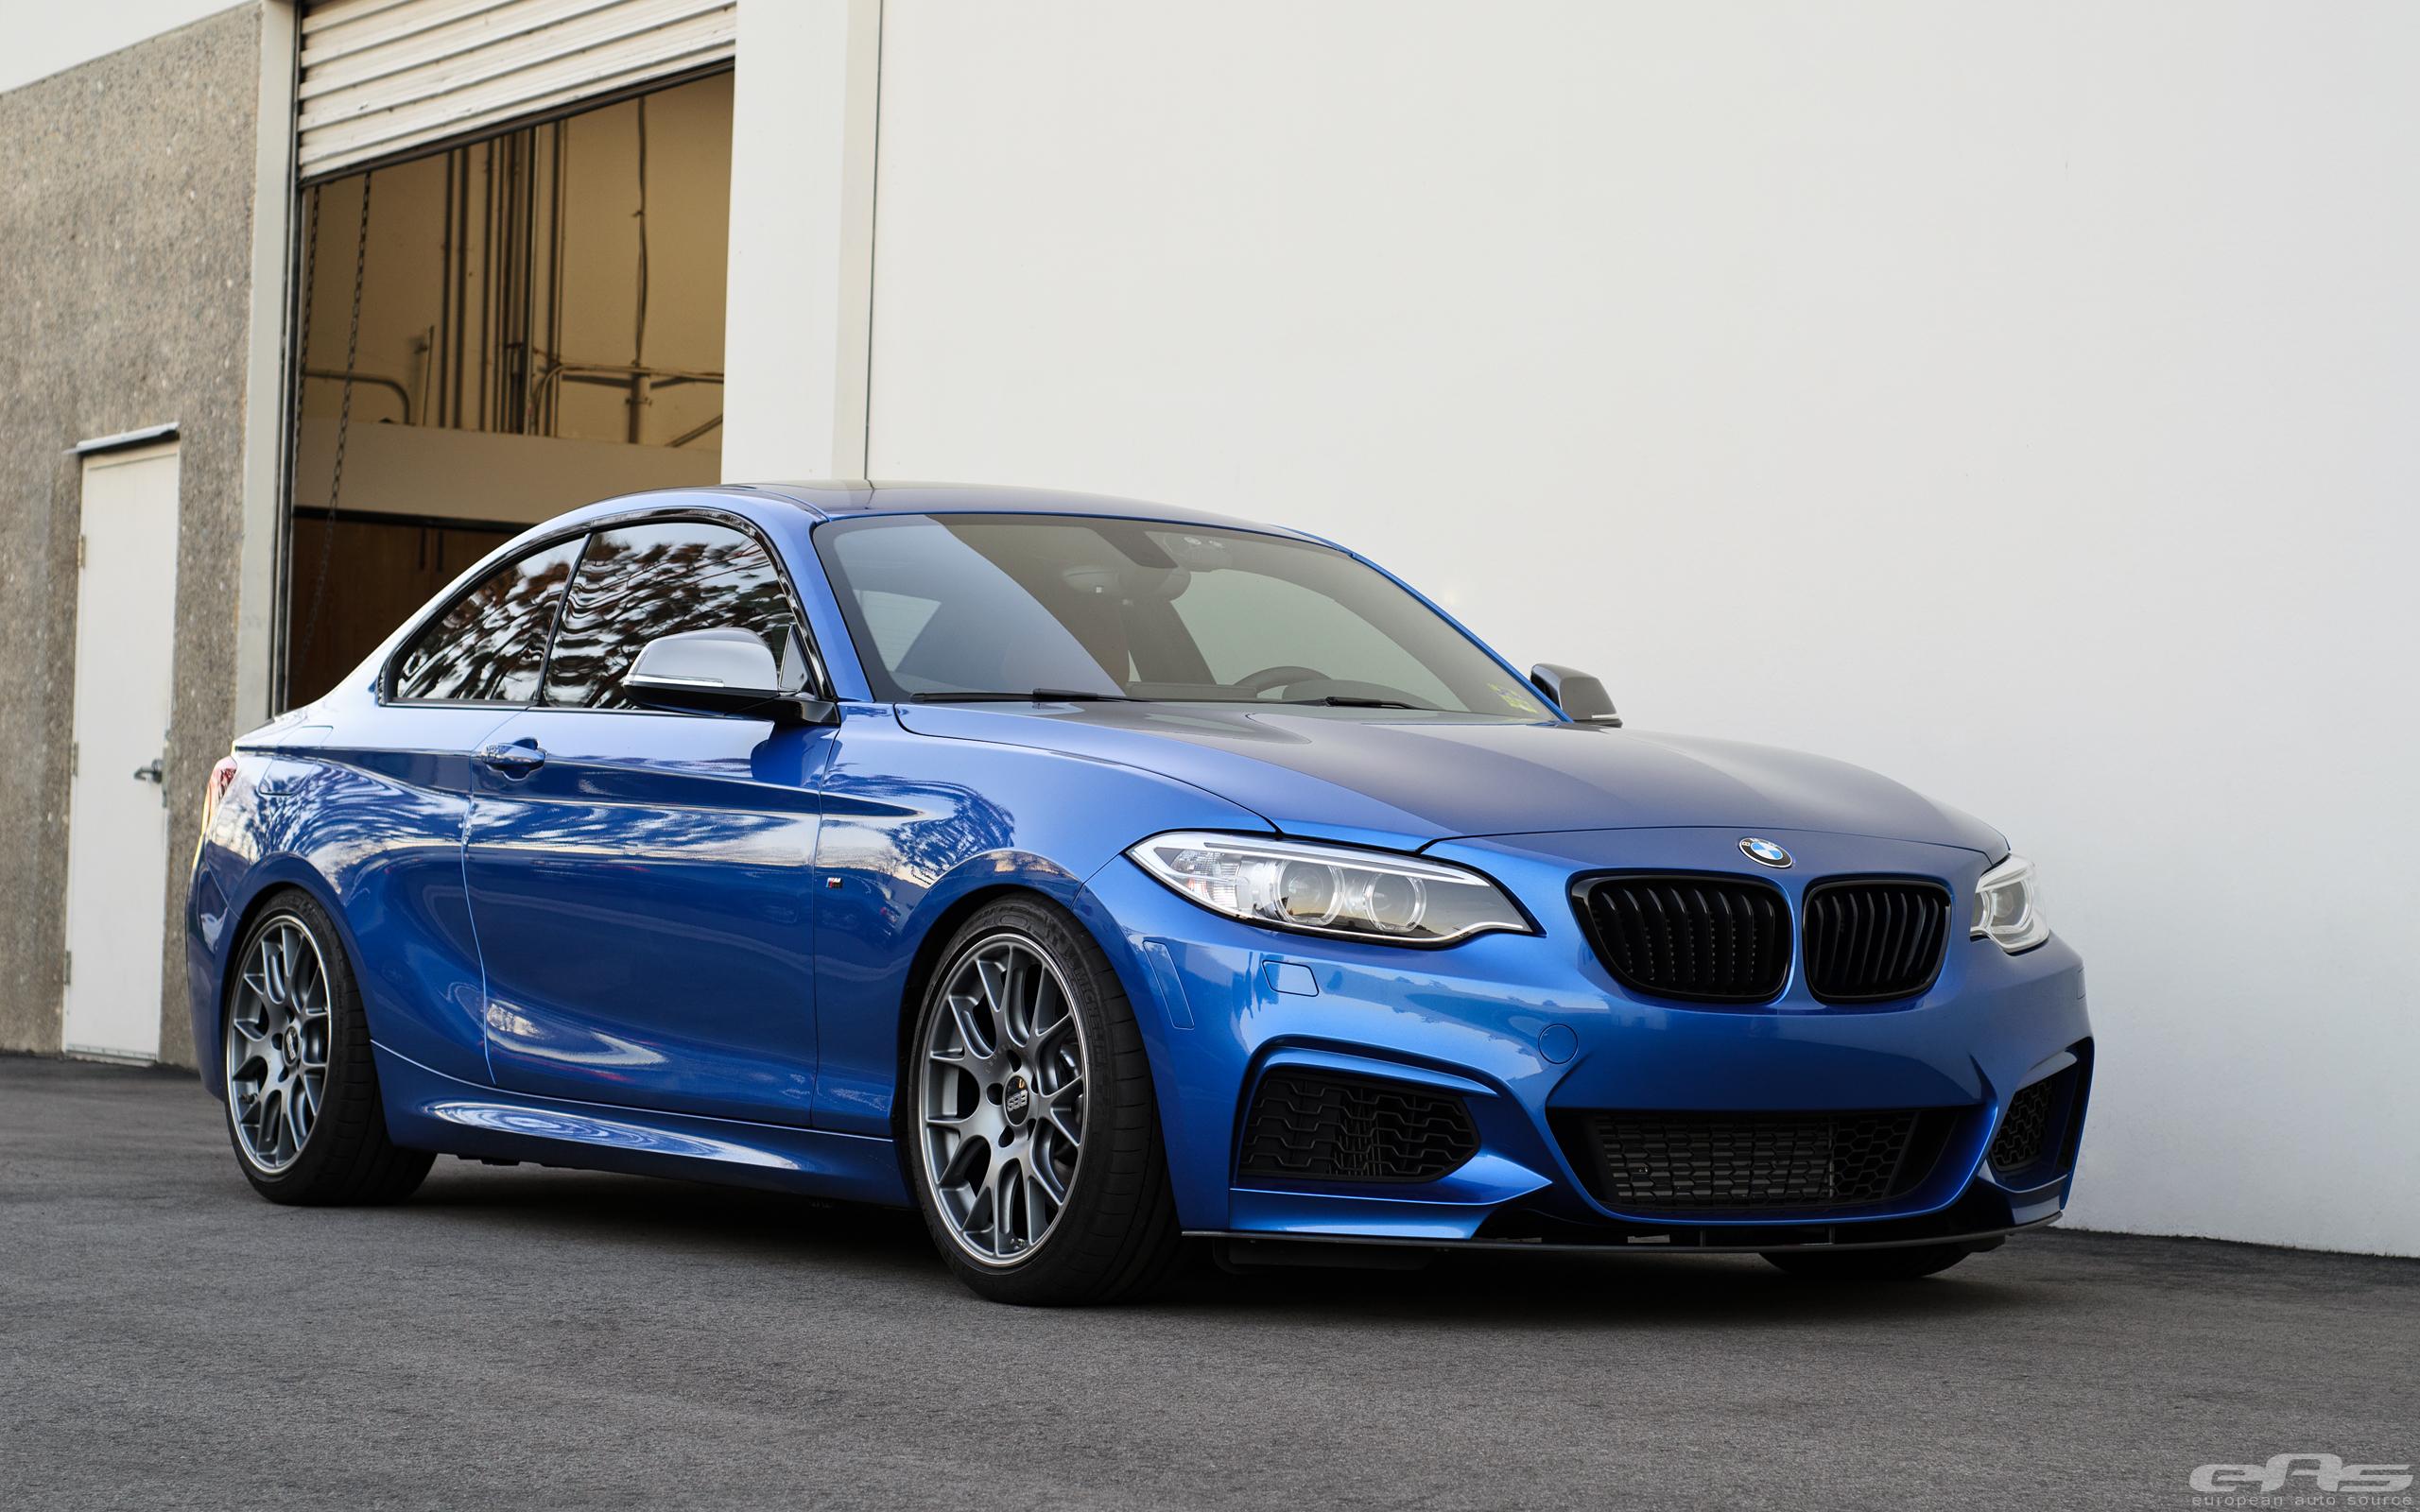 Gorgeous Estoril Blue Bmw M235i Gets Transformed Into A Beast